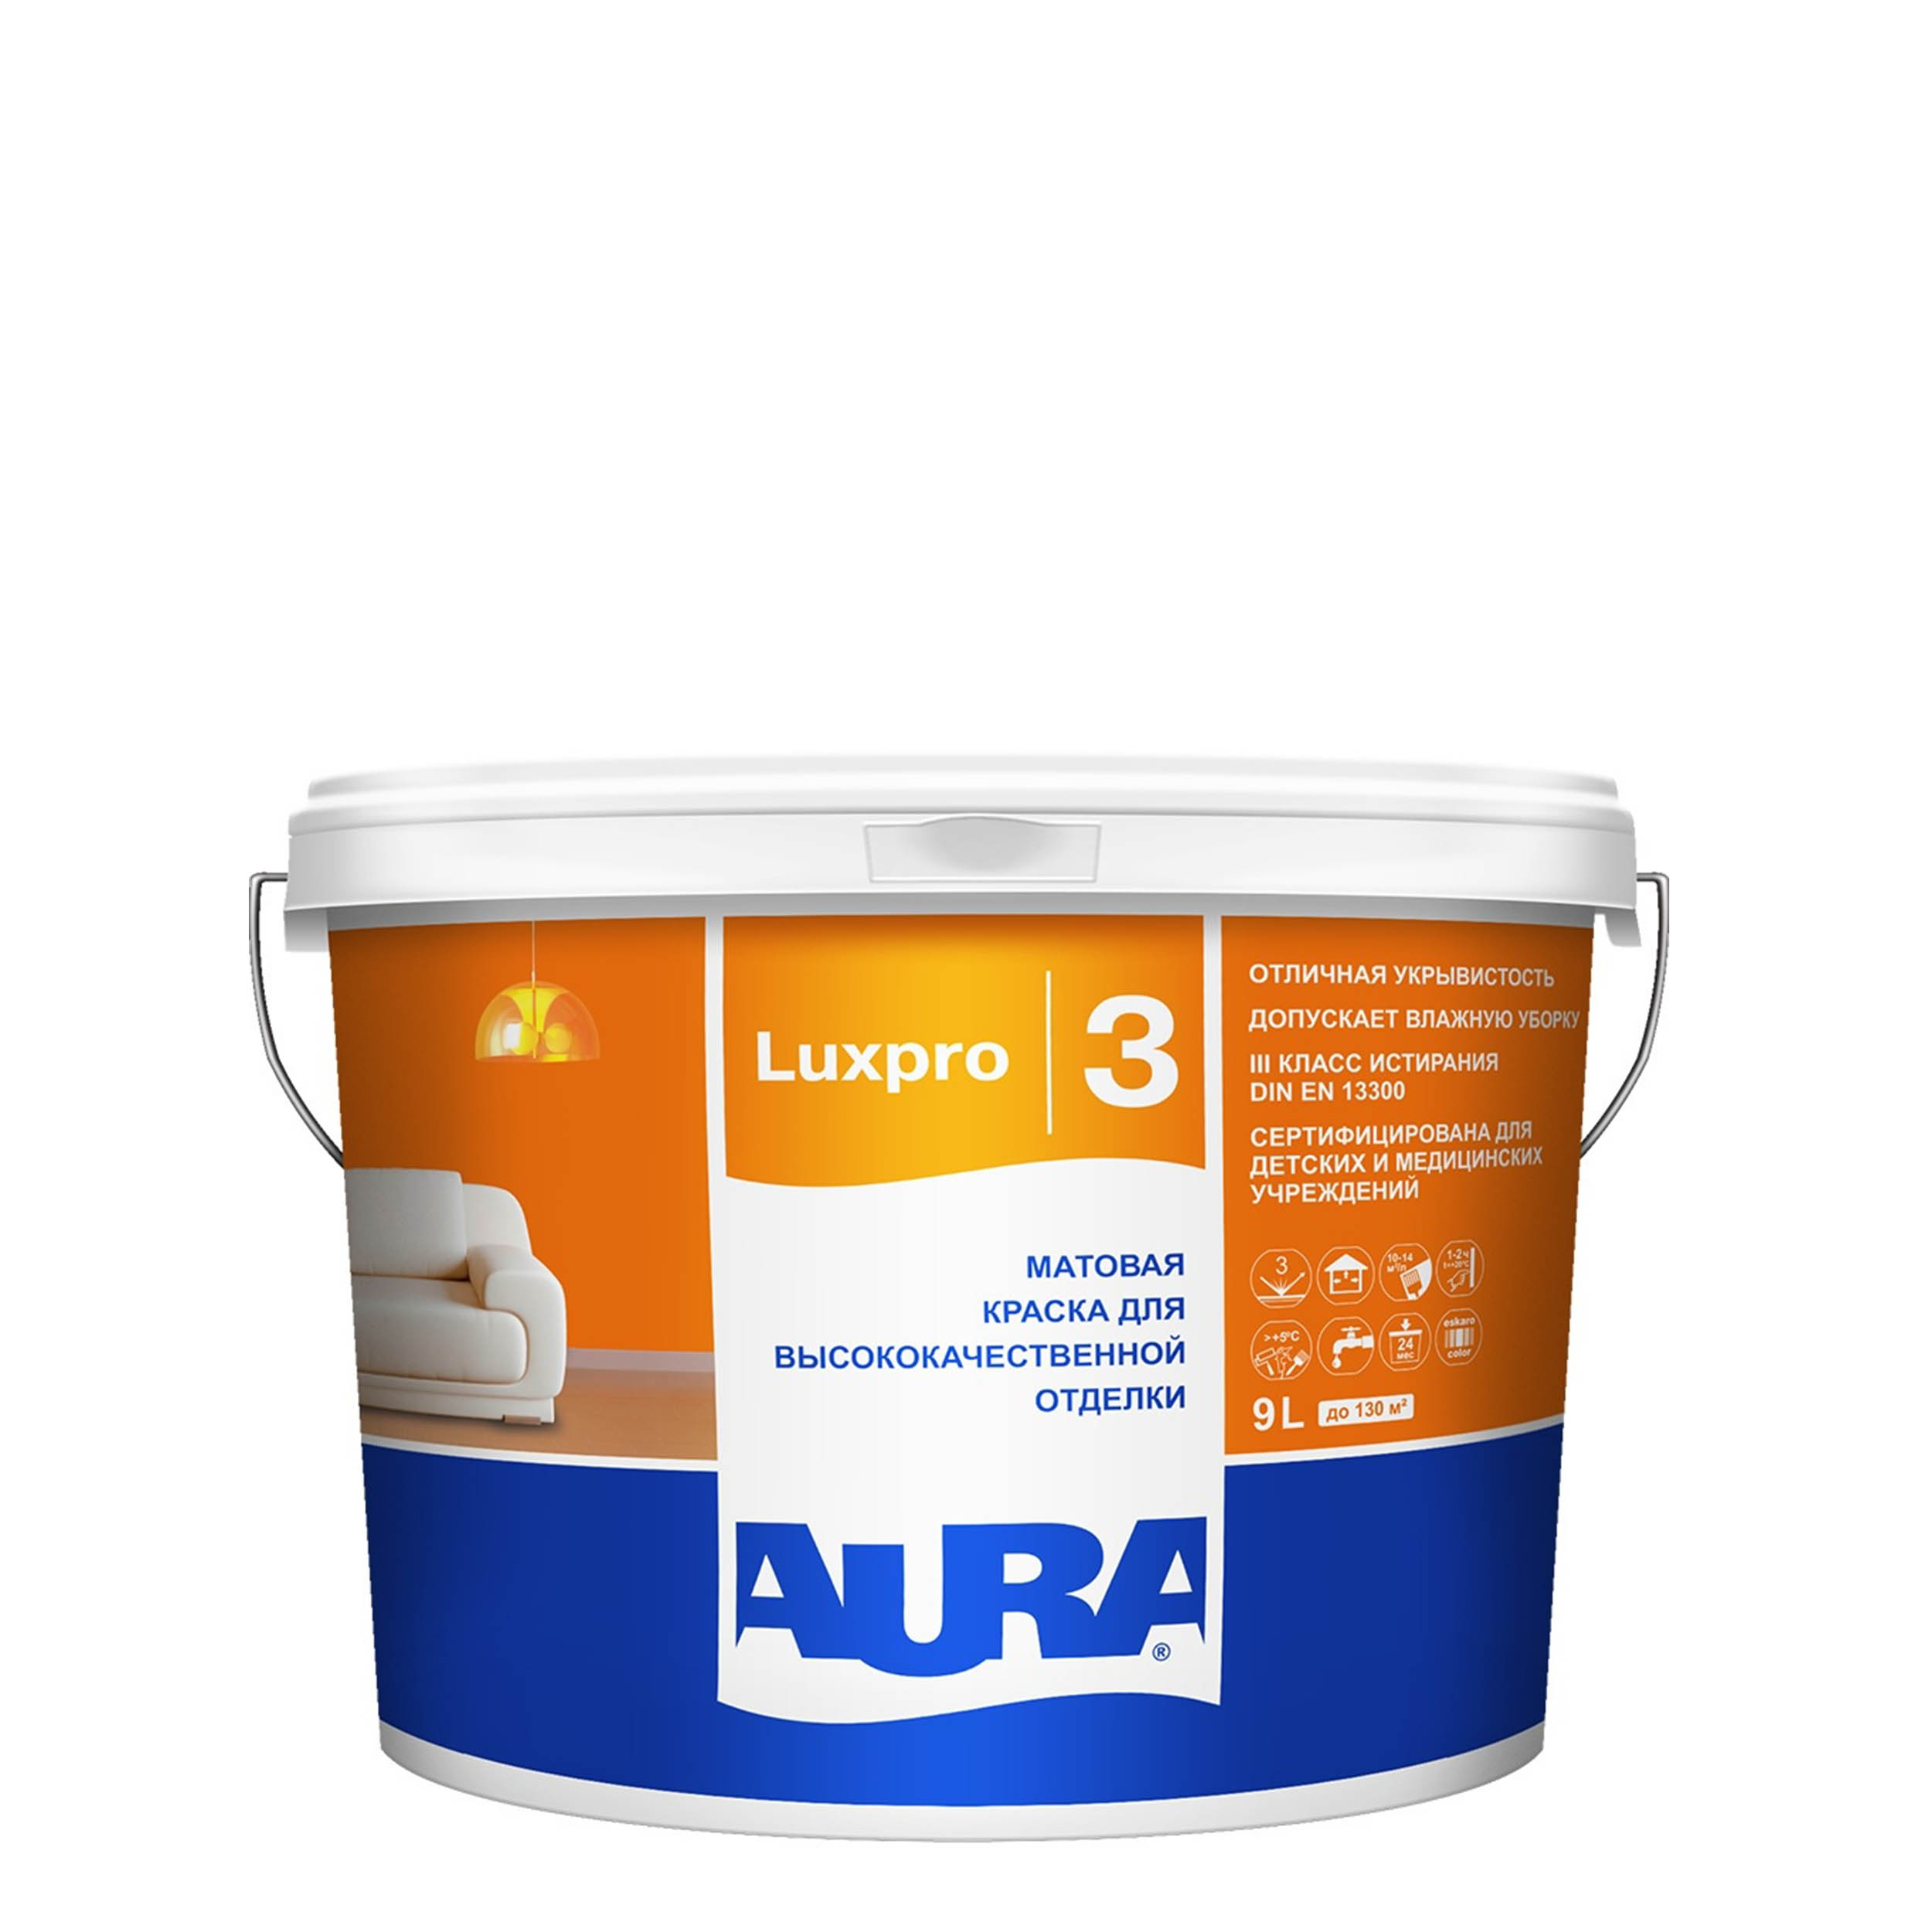 Фото 3 - Краска интерьерная, Aura LuxPRO 3, RAL 5020, 11 кг.